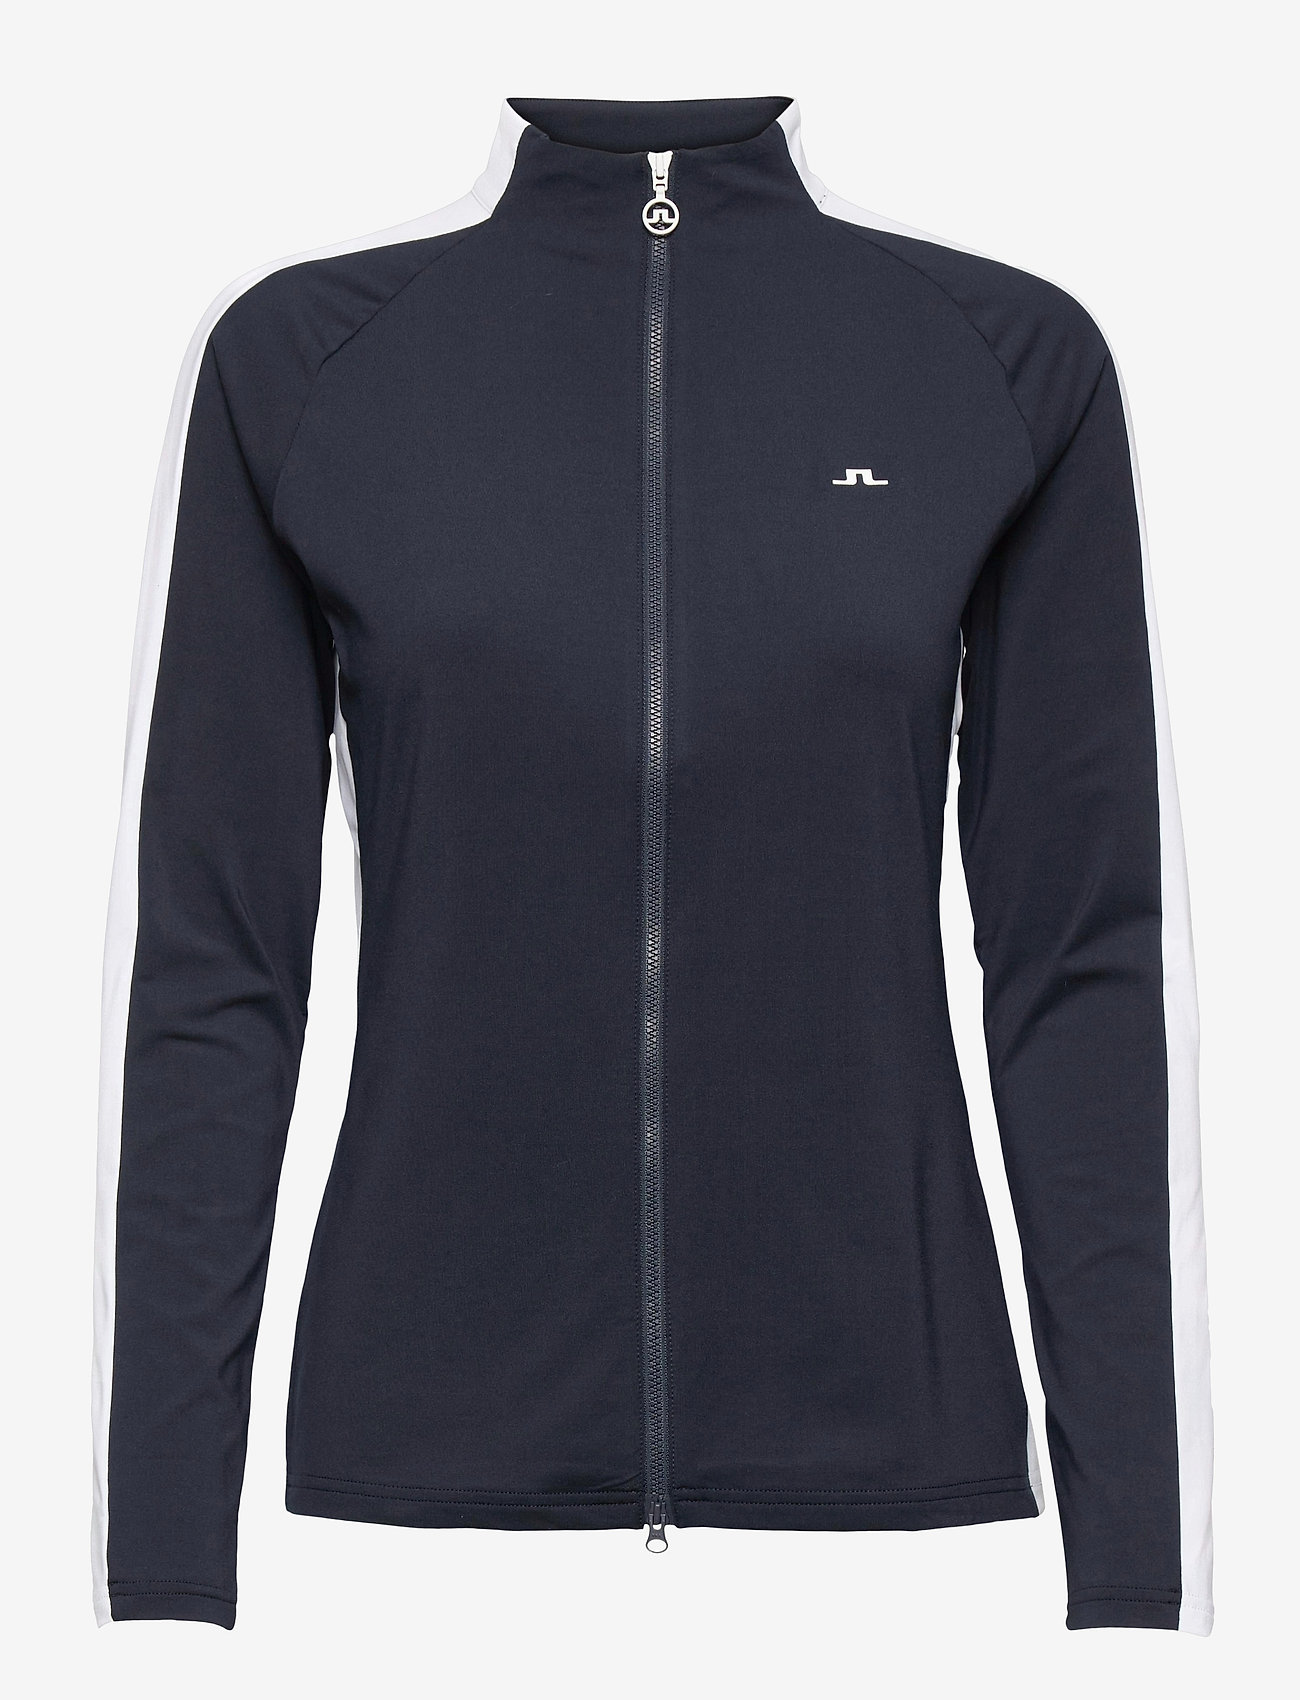 J. Lindeberg Golf - Marie Golf Mid Layer - golf jackets - jl navy - 1